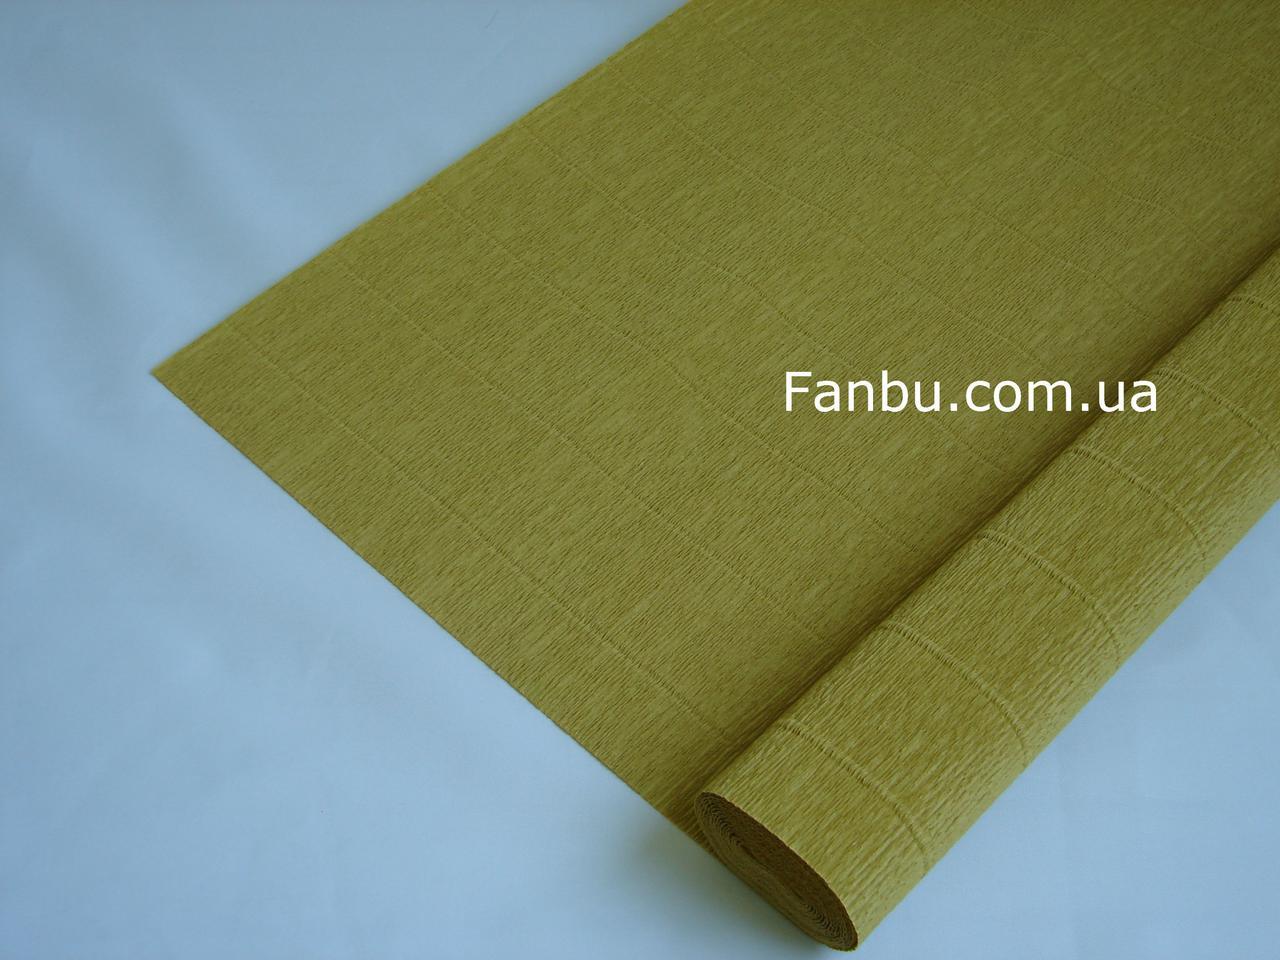 Креп бумага горчичная №579,производство Италия, фото 1